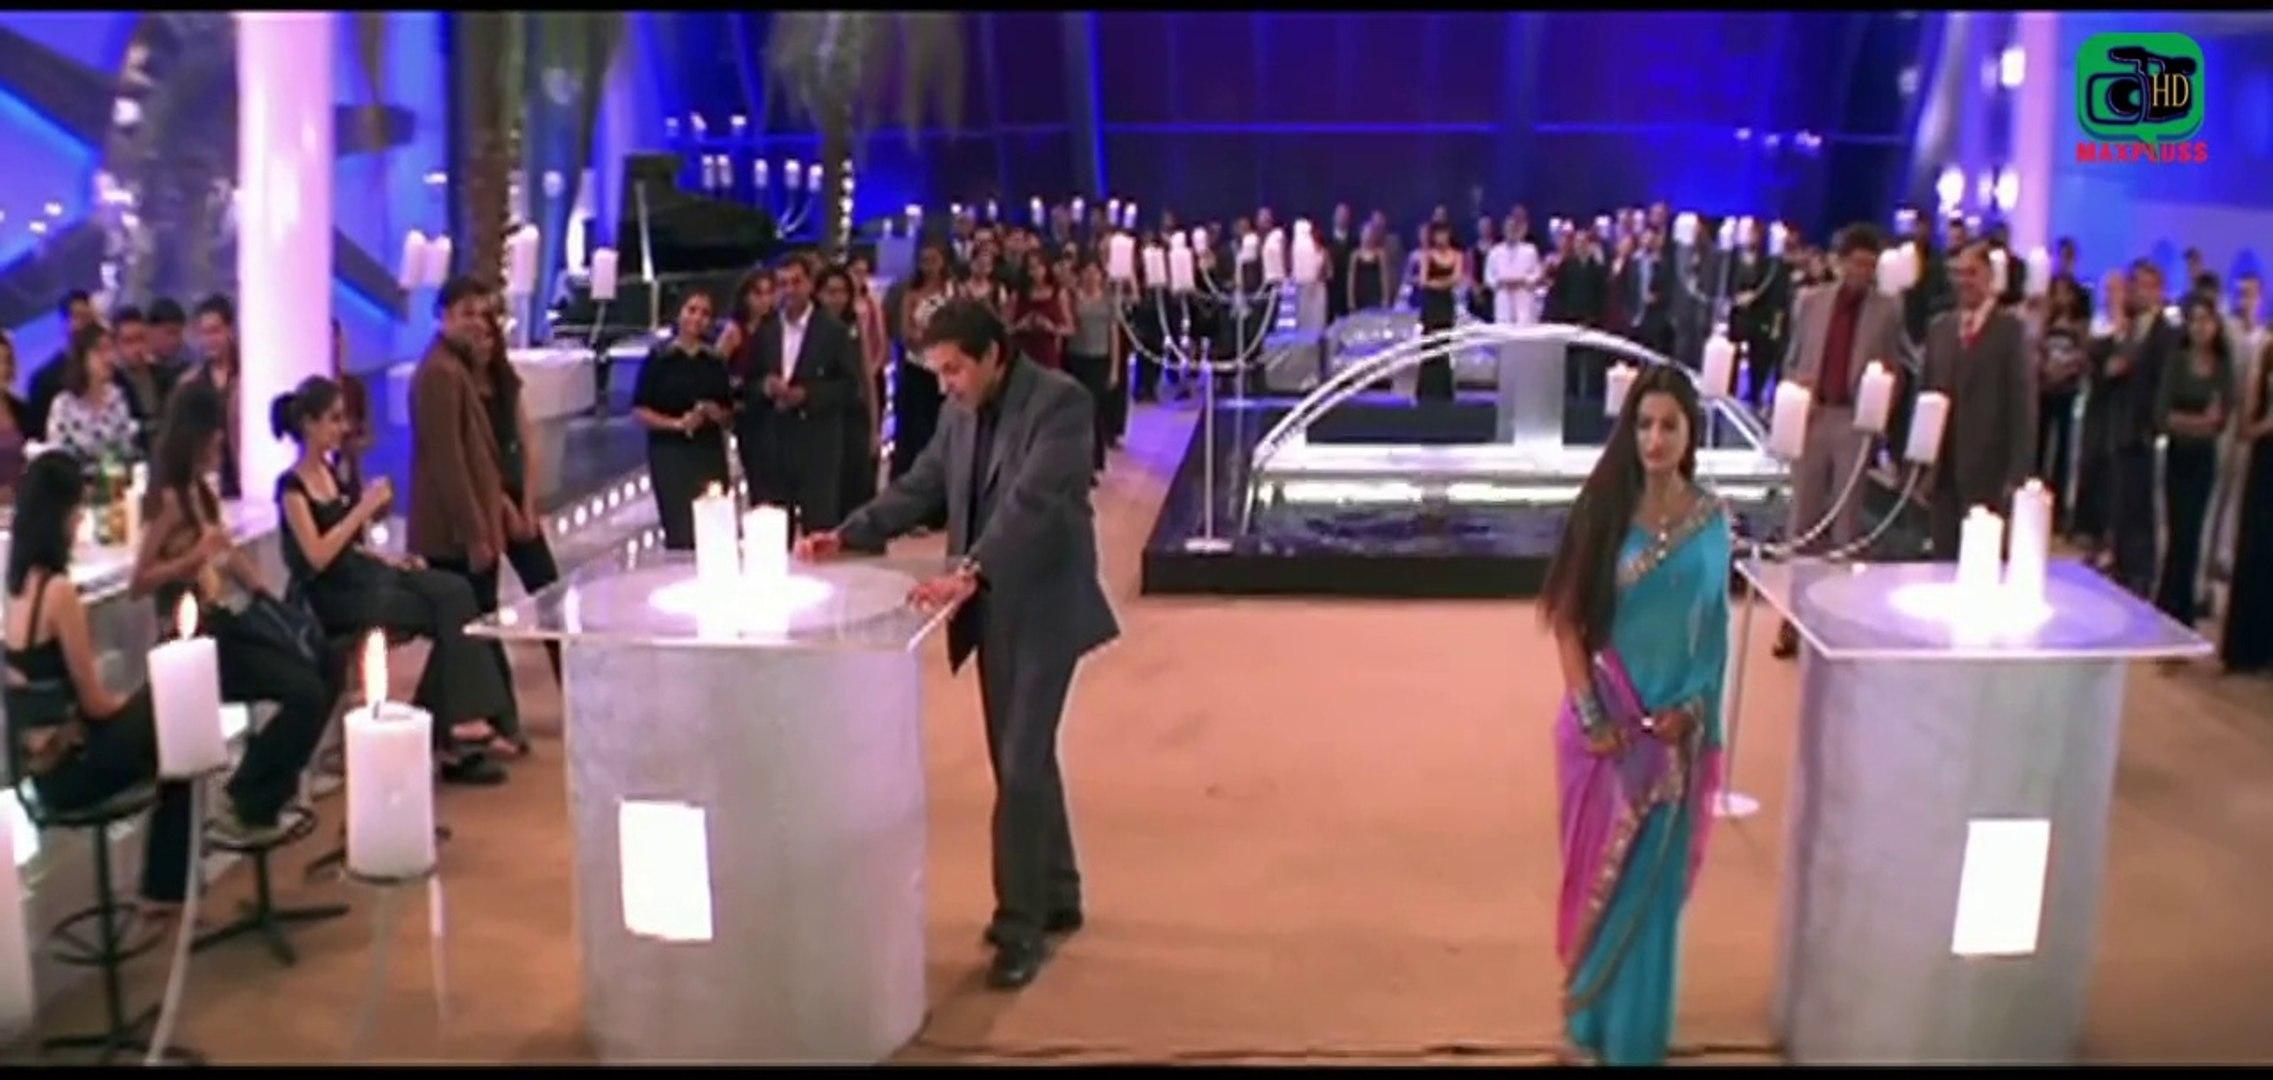 Chori Se Dil Ko Chura Le Koi   Full Video Song     HD-720p   Humko Tumse Pyaar Hai   Ameesha Patel-B